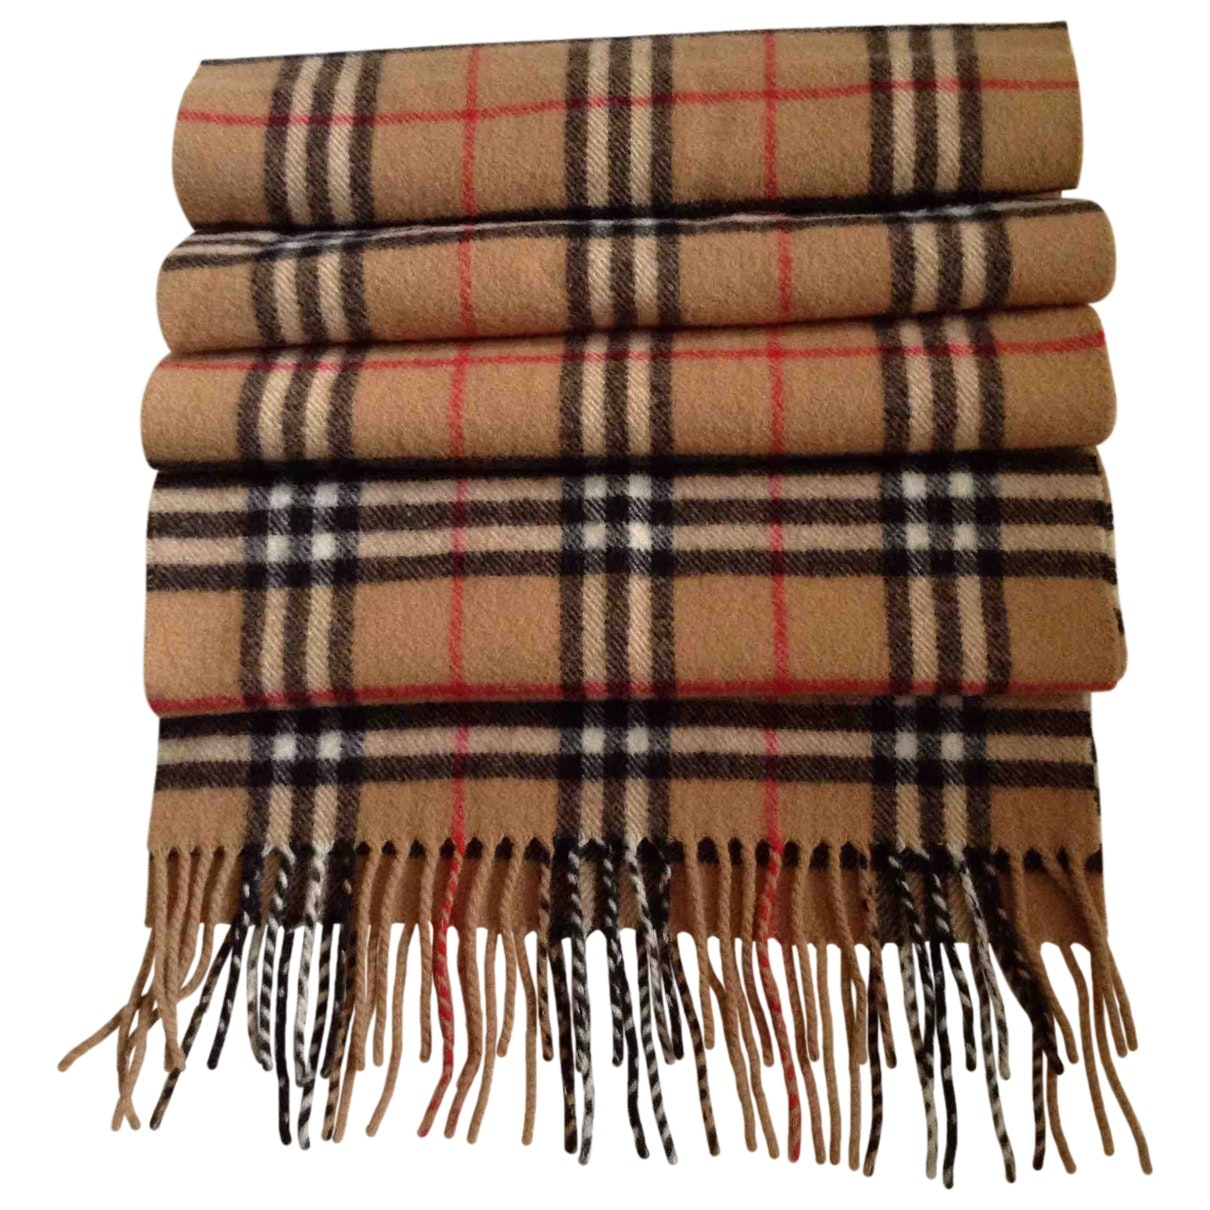 Echarpe burberry 50 cachemire 50 laine